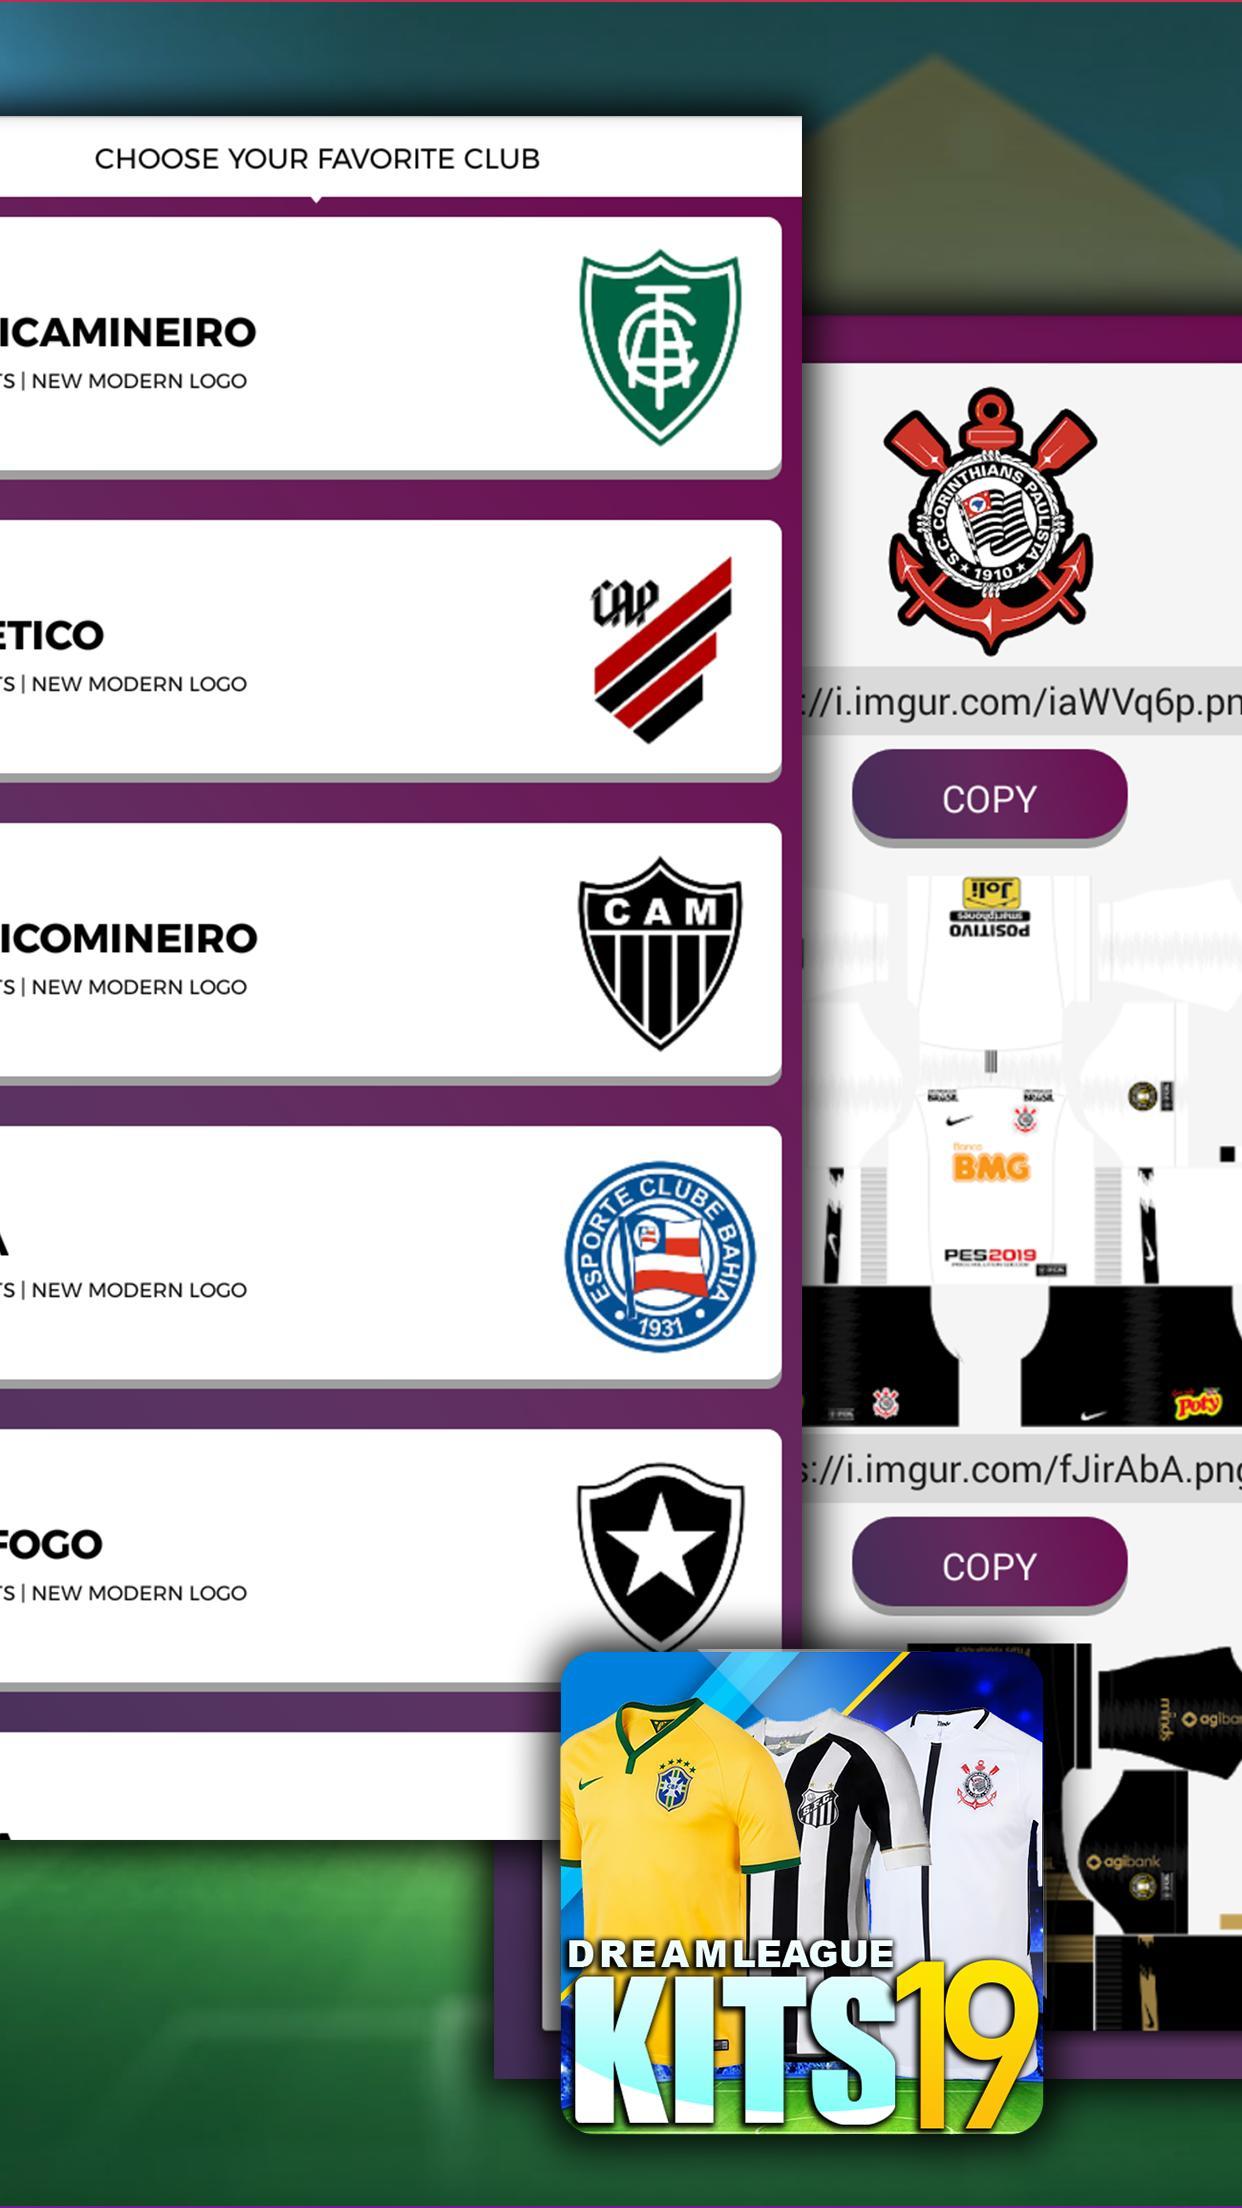 Dream League Brasileiro kits soccer Brazil for Android - APK